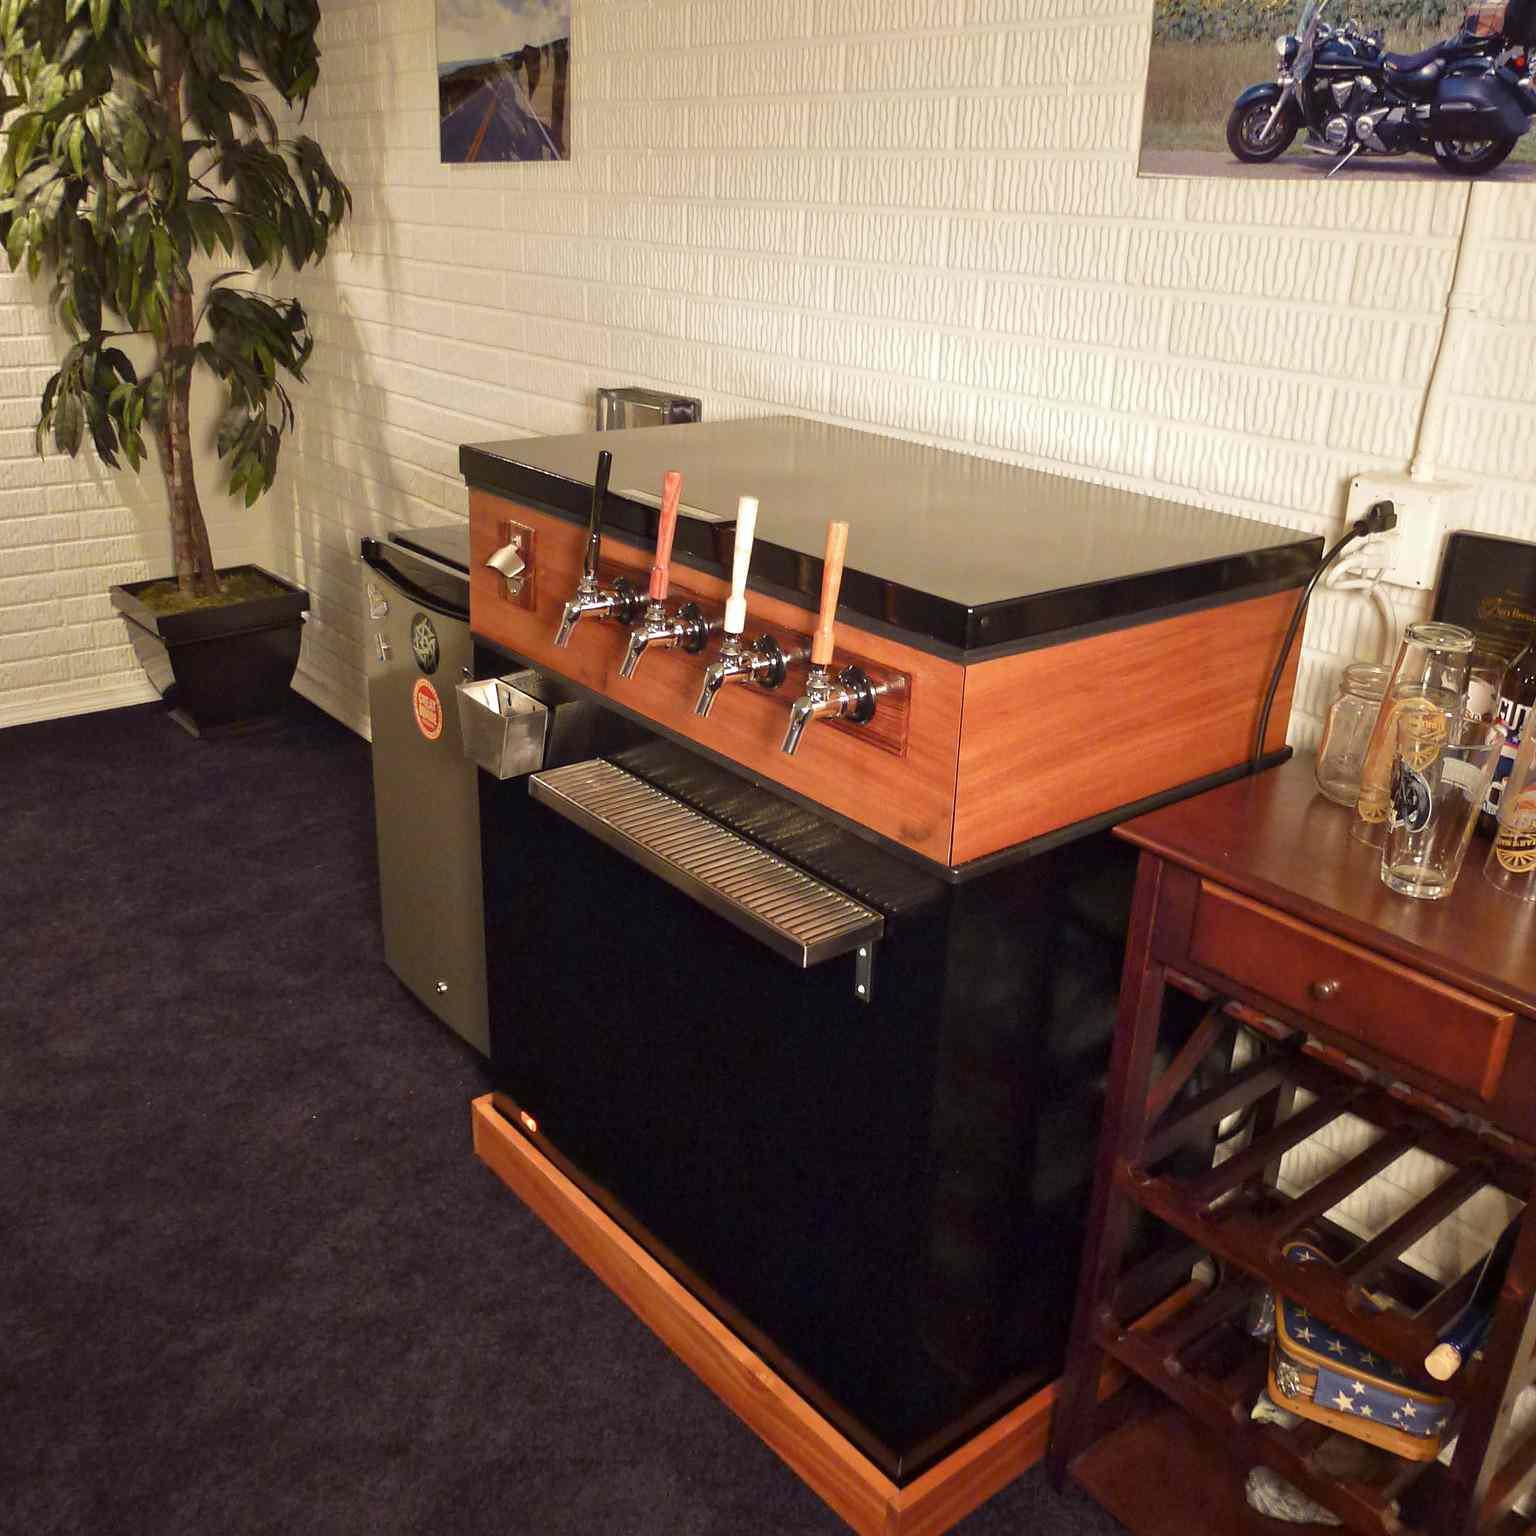 kegerator sadly without raspberry pi display